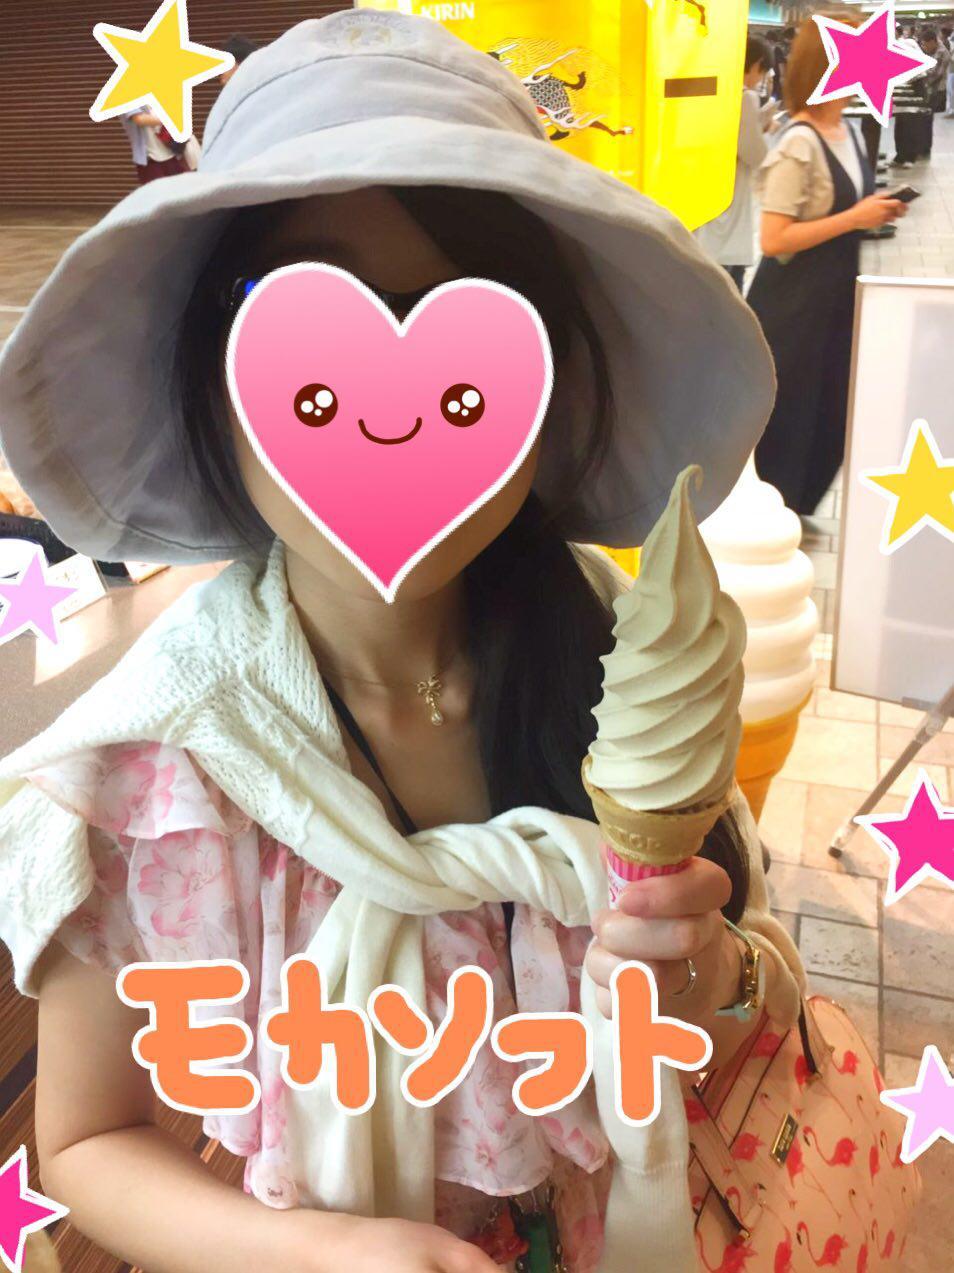 photo_2017-05-21_21-48-10.jpg